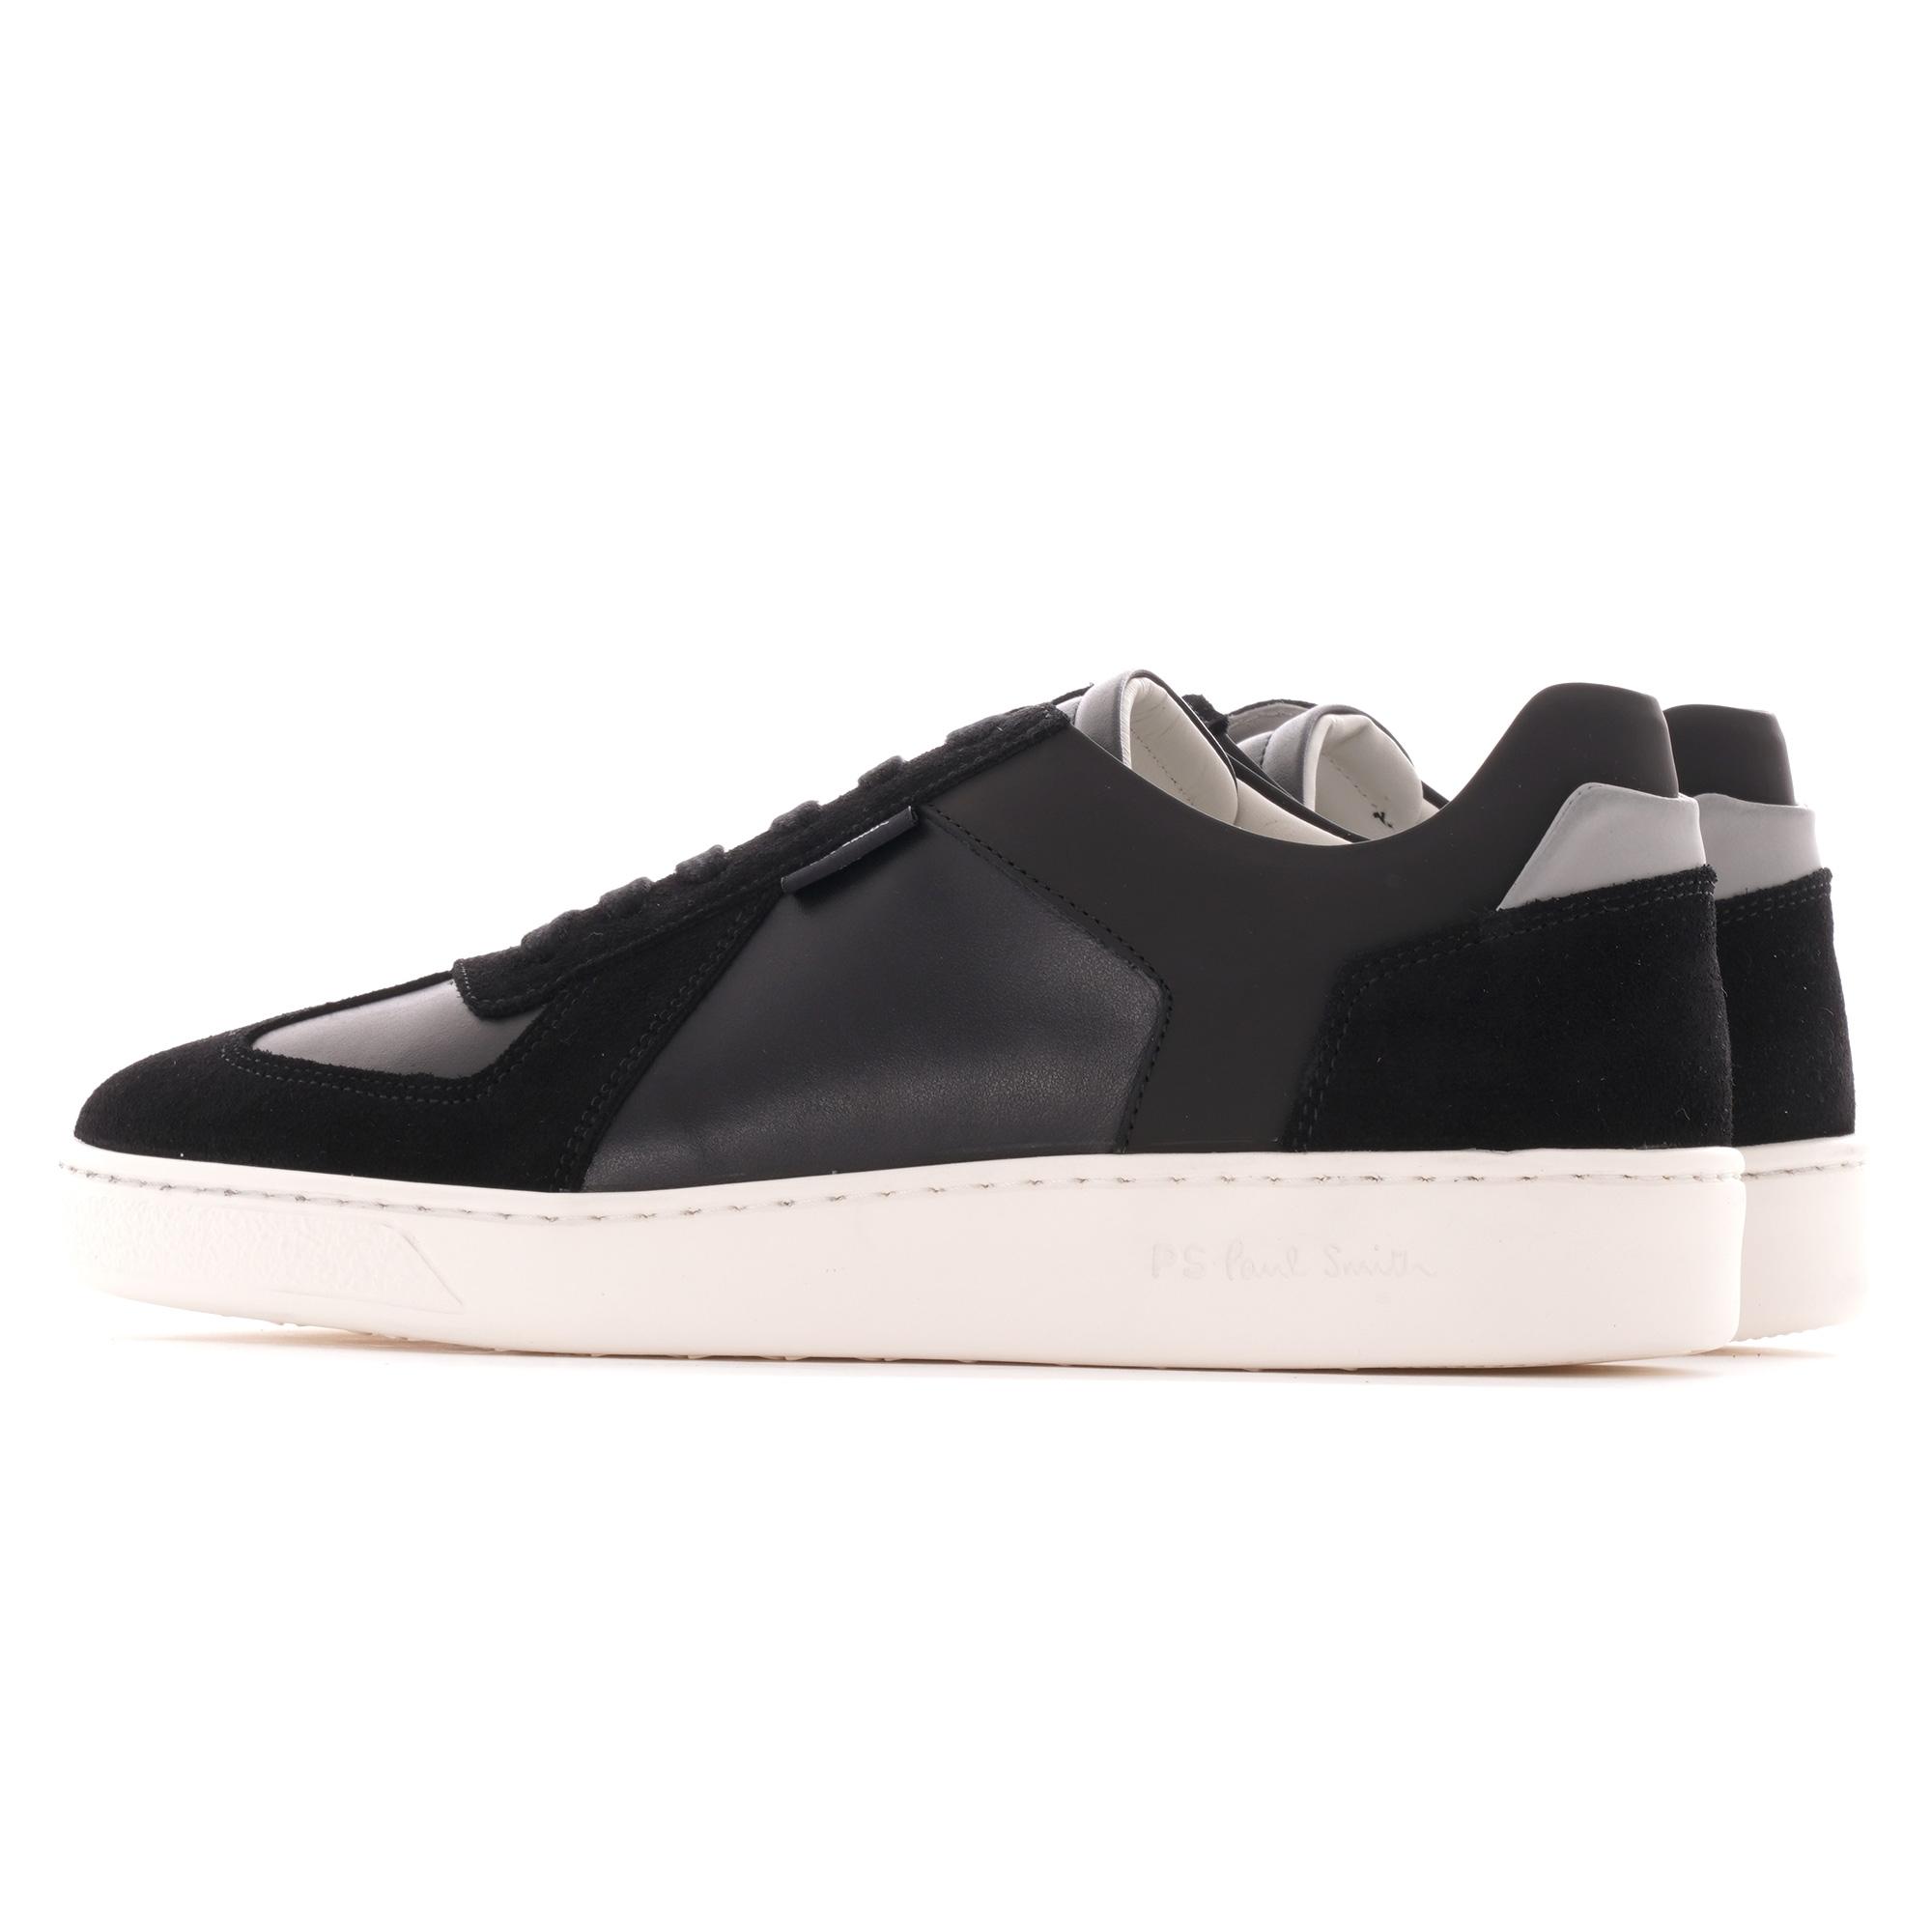 PS by Paul Smith Cross sneakers | Black